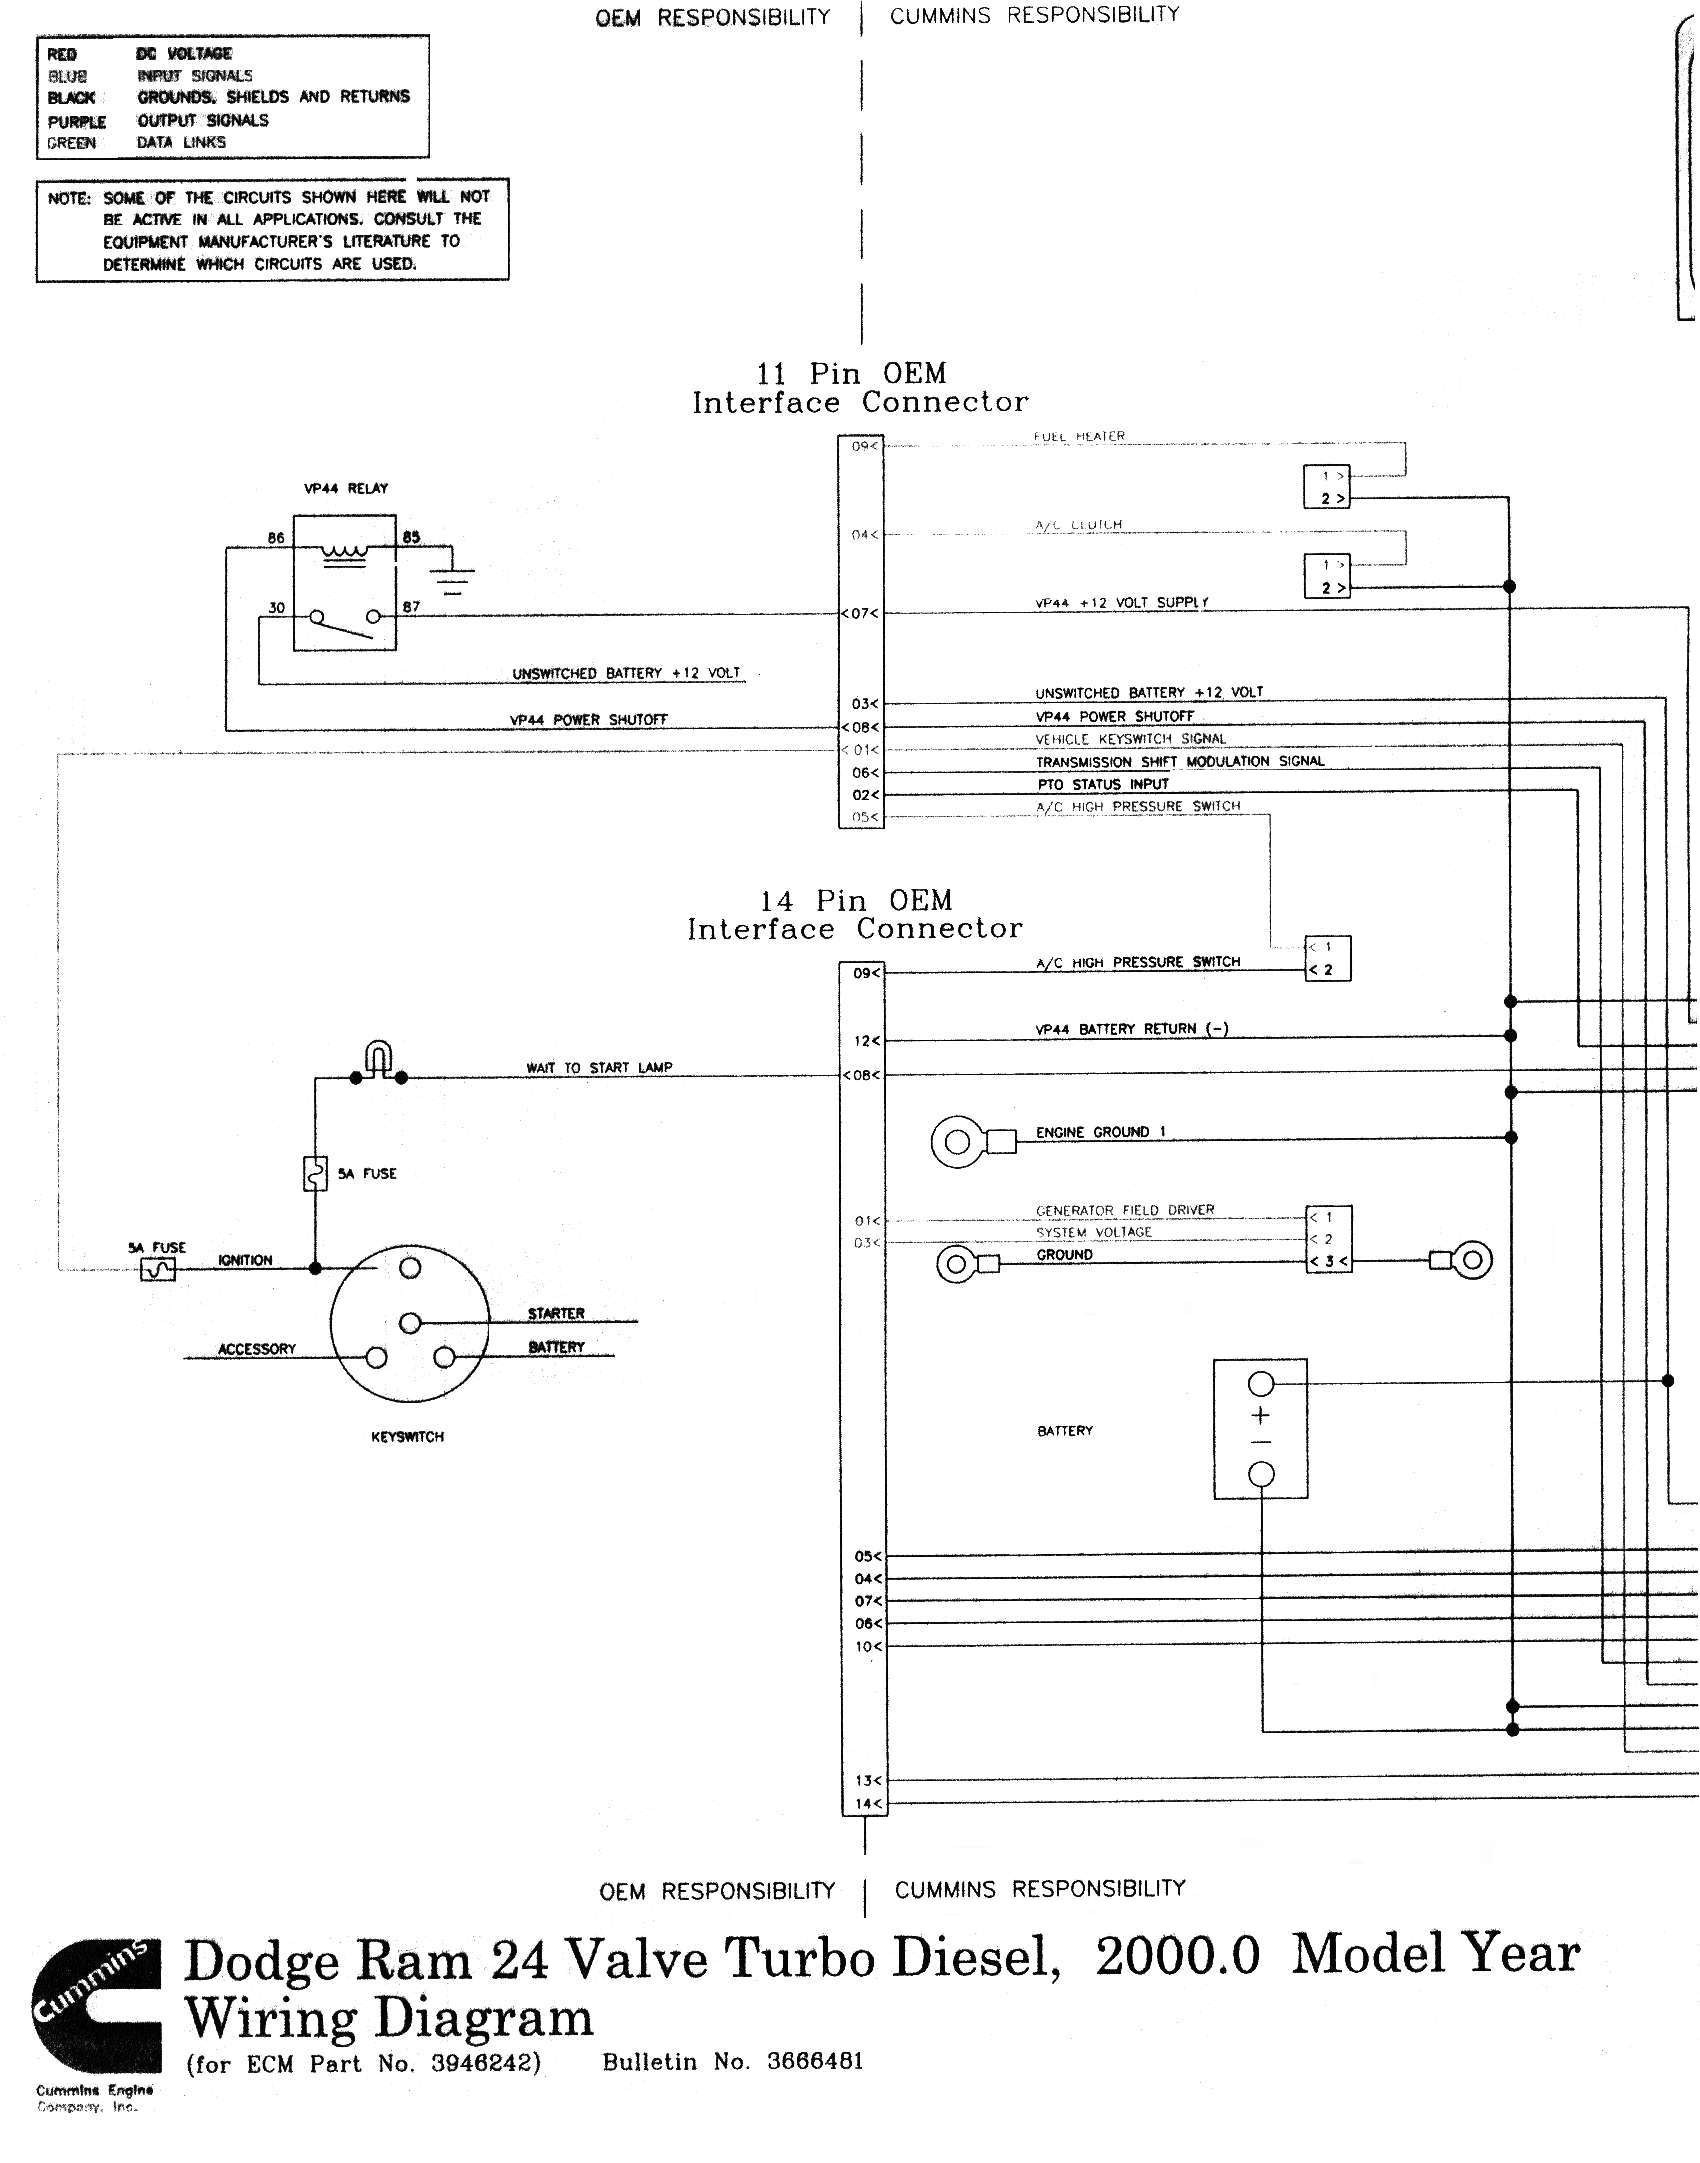 hight resolution of ram 2500 wiring diagram electrical schematic wiring diagram 2002 dodge ram 2500 wiring diagram fuel pump 2002 dodge ram 2500 wiring diagram